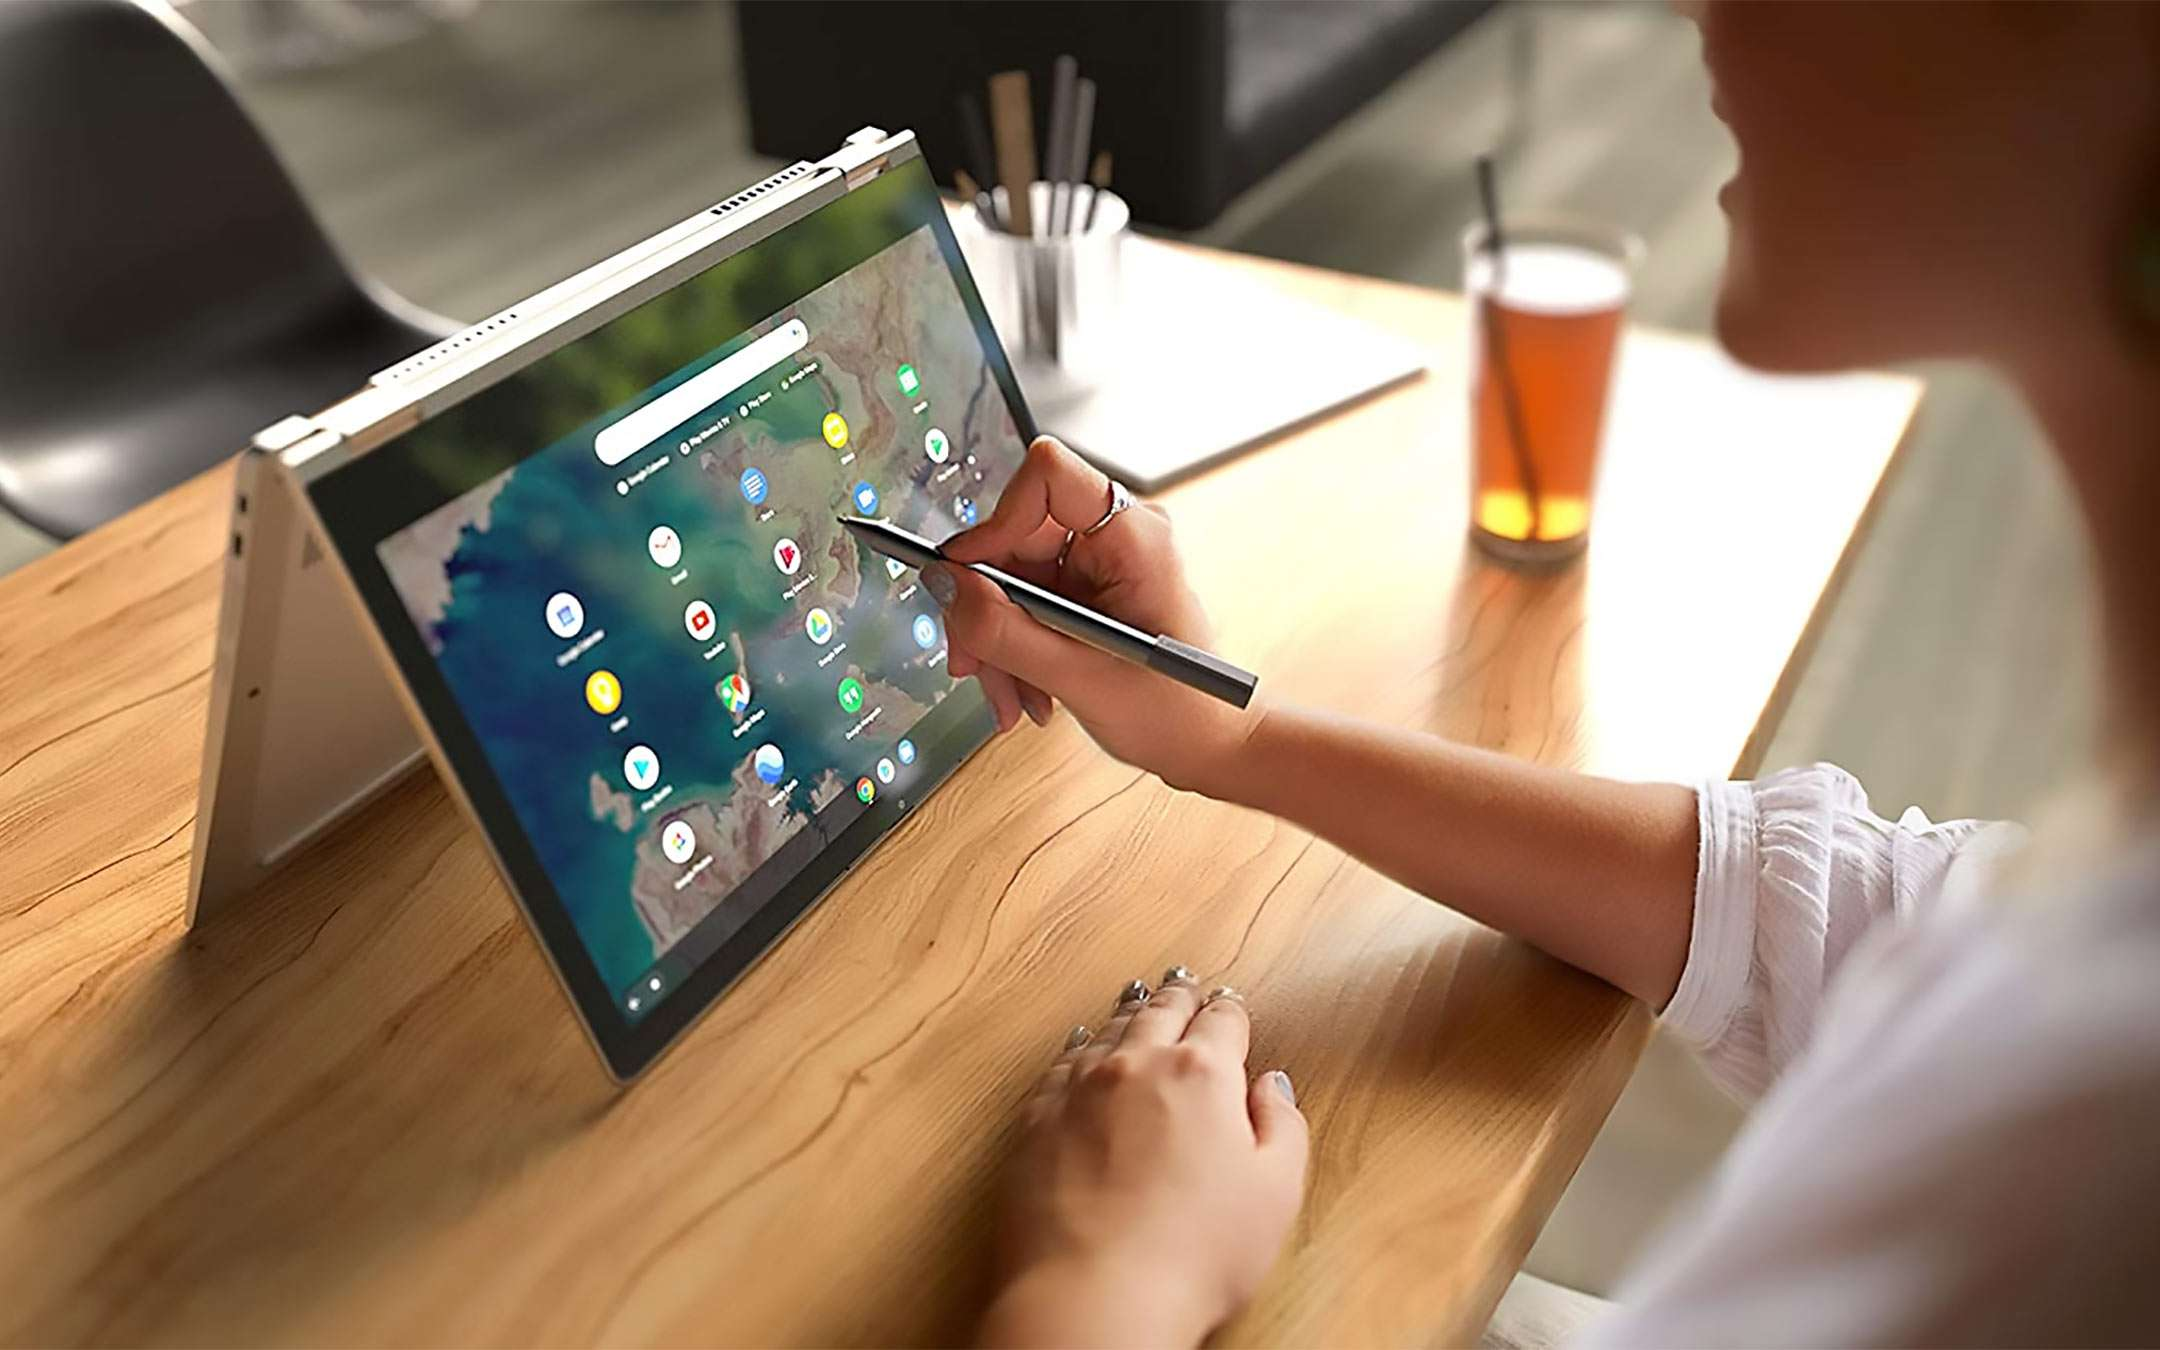 The Lenovo IdeaPad Flex 5 Chromebook on offer